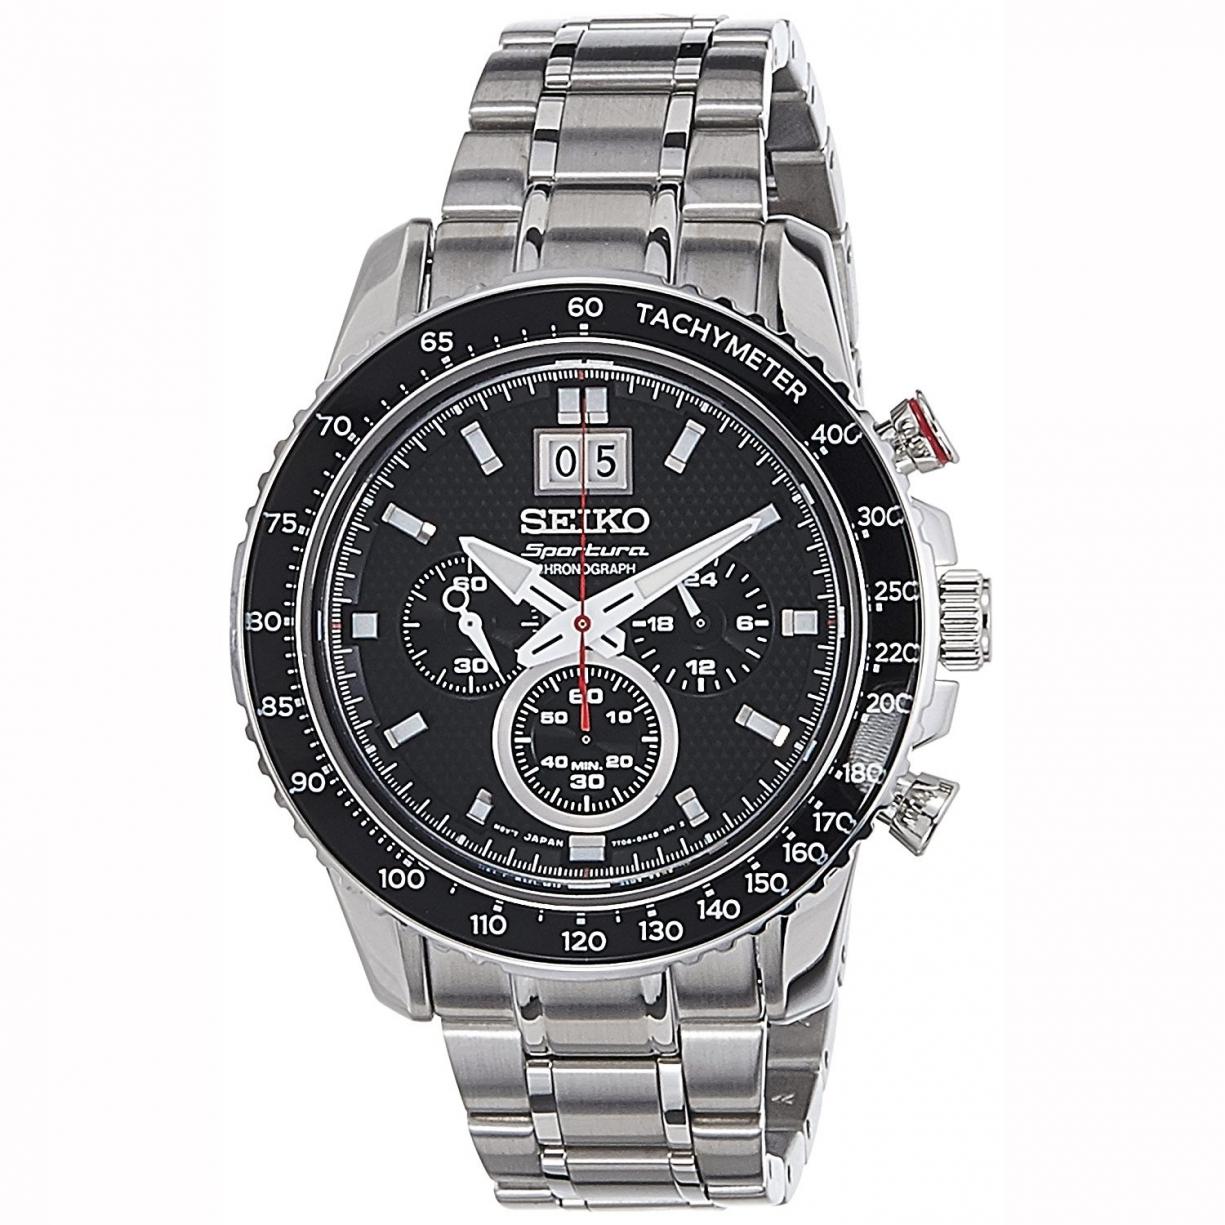 6d617e48be7c Reloj De Pulsera Seiko Cronografo Para Hombre. Modelo Spc137p1